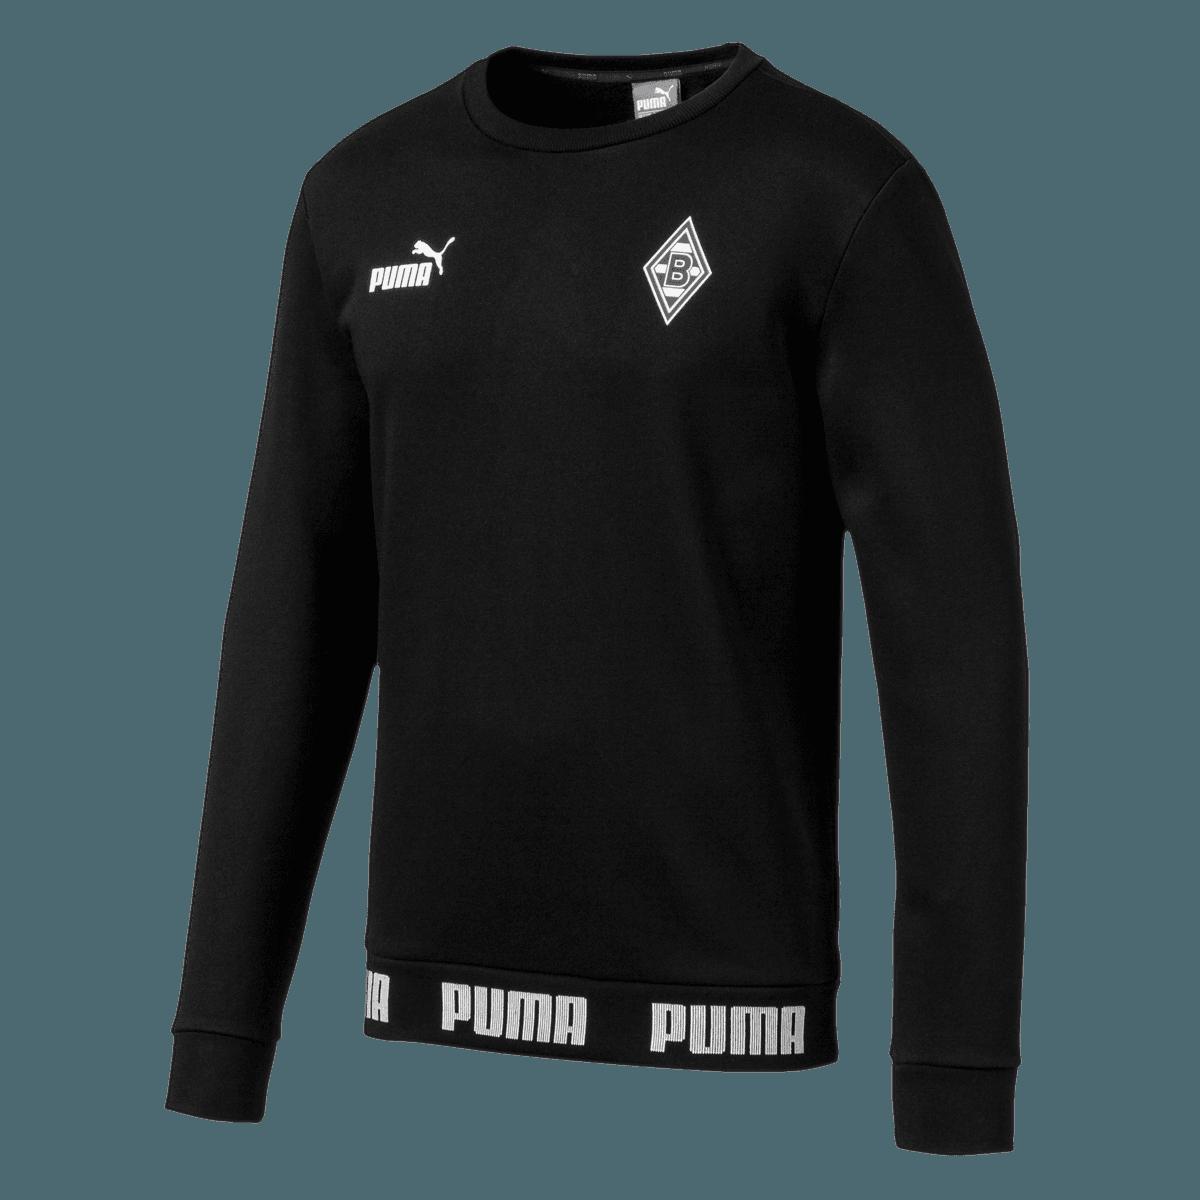 puma borussia monchengladbach pullover ftbl culture sweater schwarz weiss